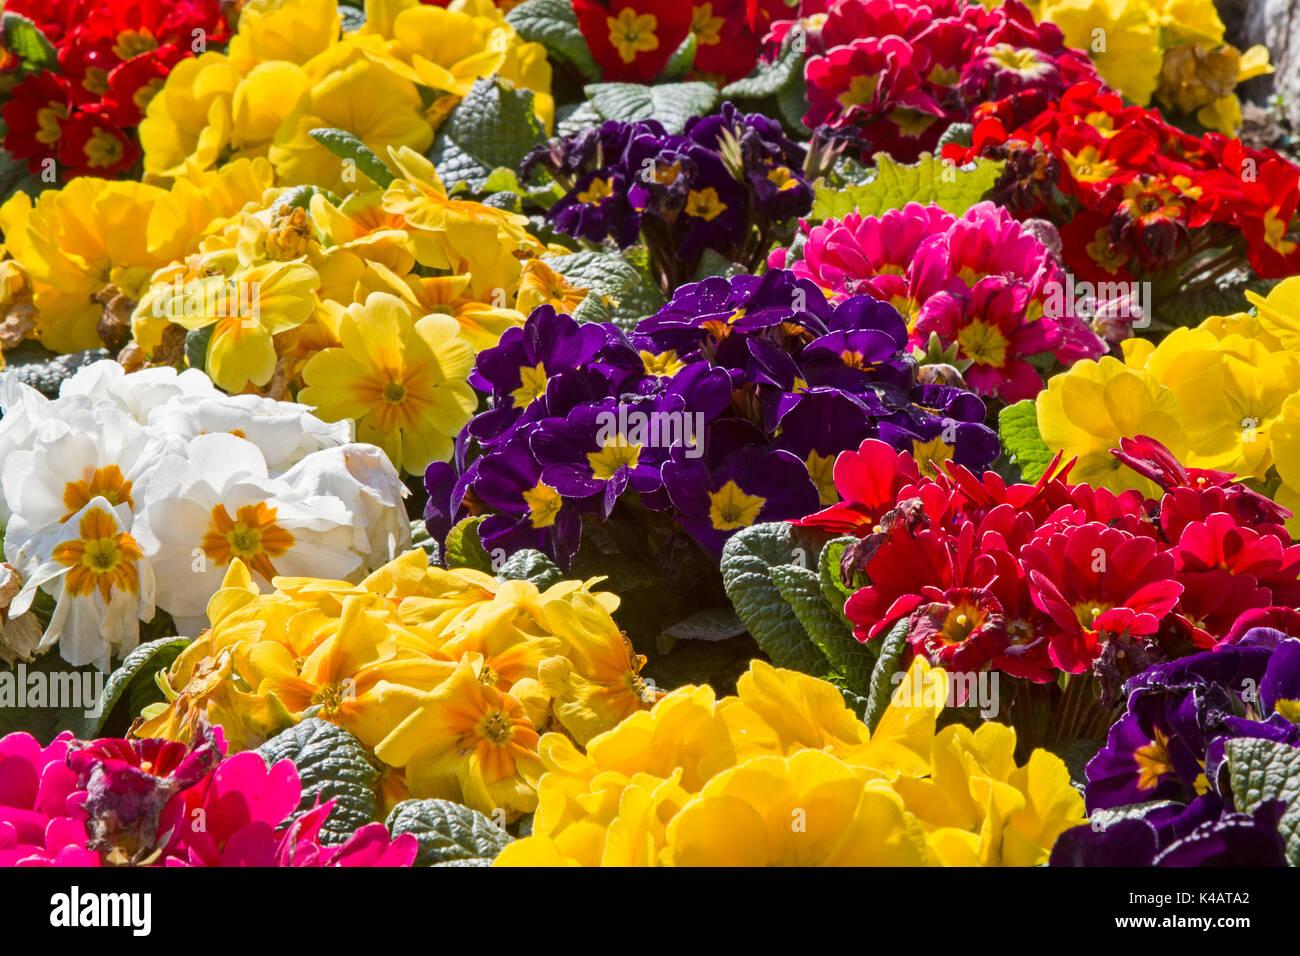 Viele Bunte Frühlingsblumen Immagini Stock